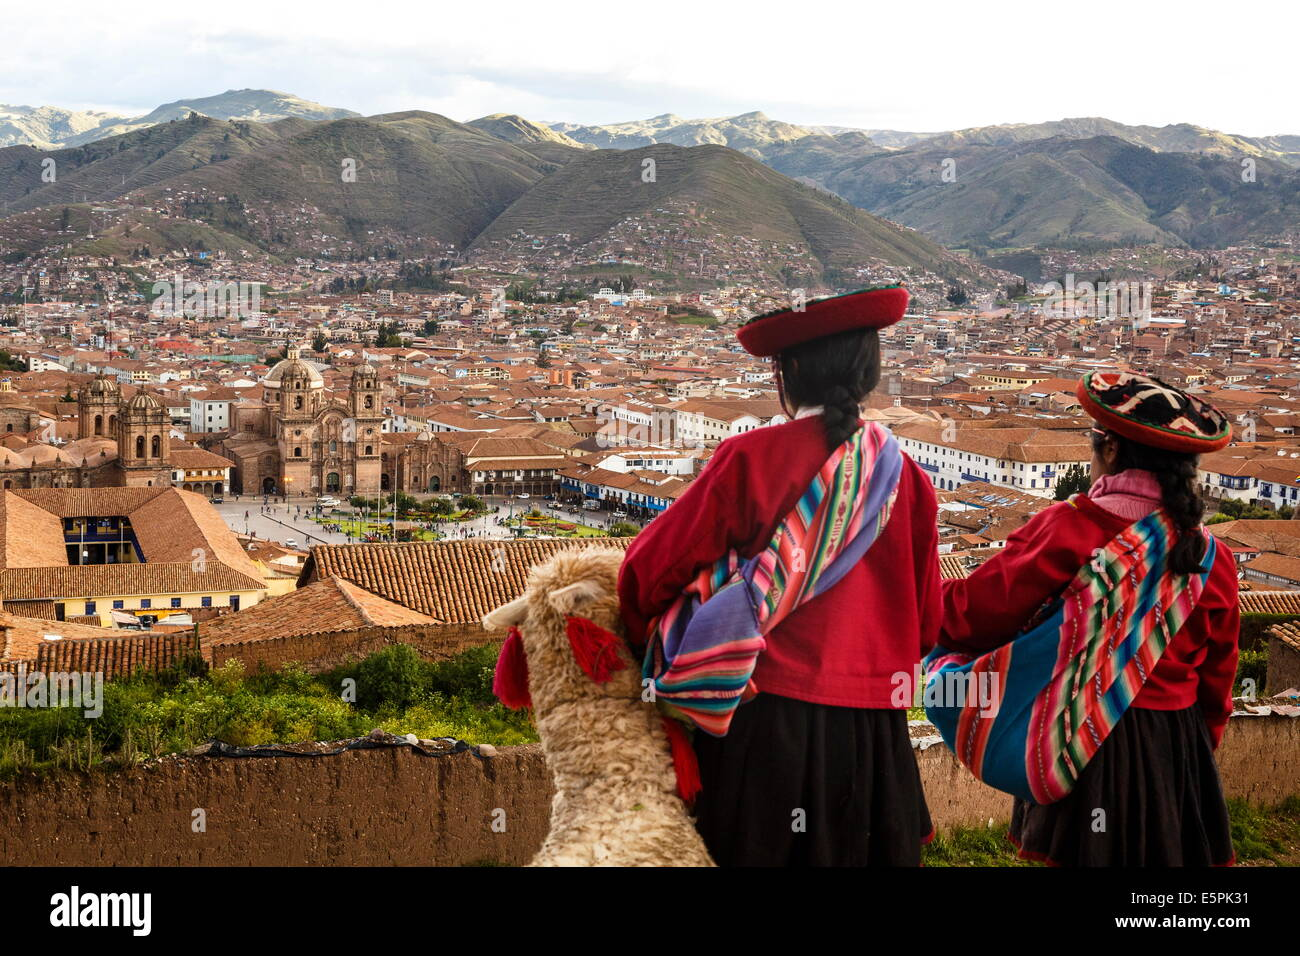 Elevated view over Cuzco and Plaza de Armas, Cuzco, UNESCO World Heritage Site, Peru, South America - Stock Image